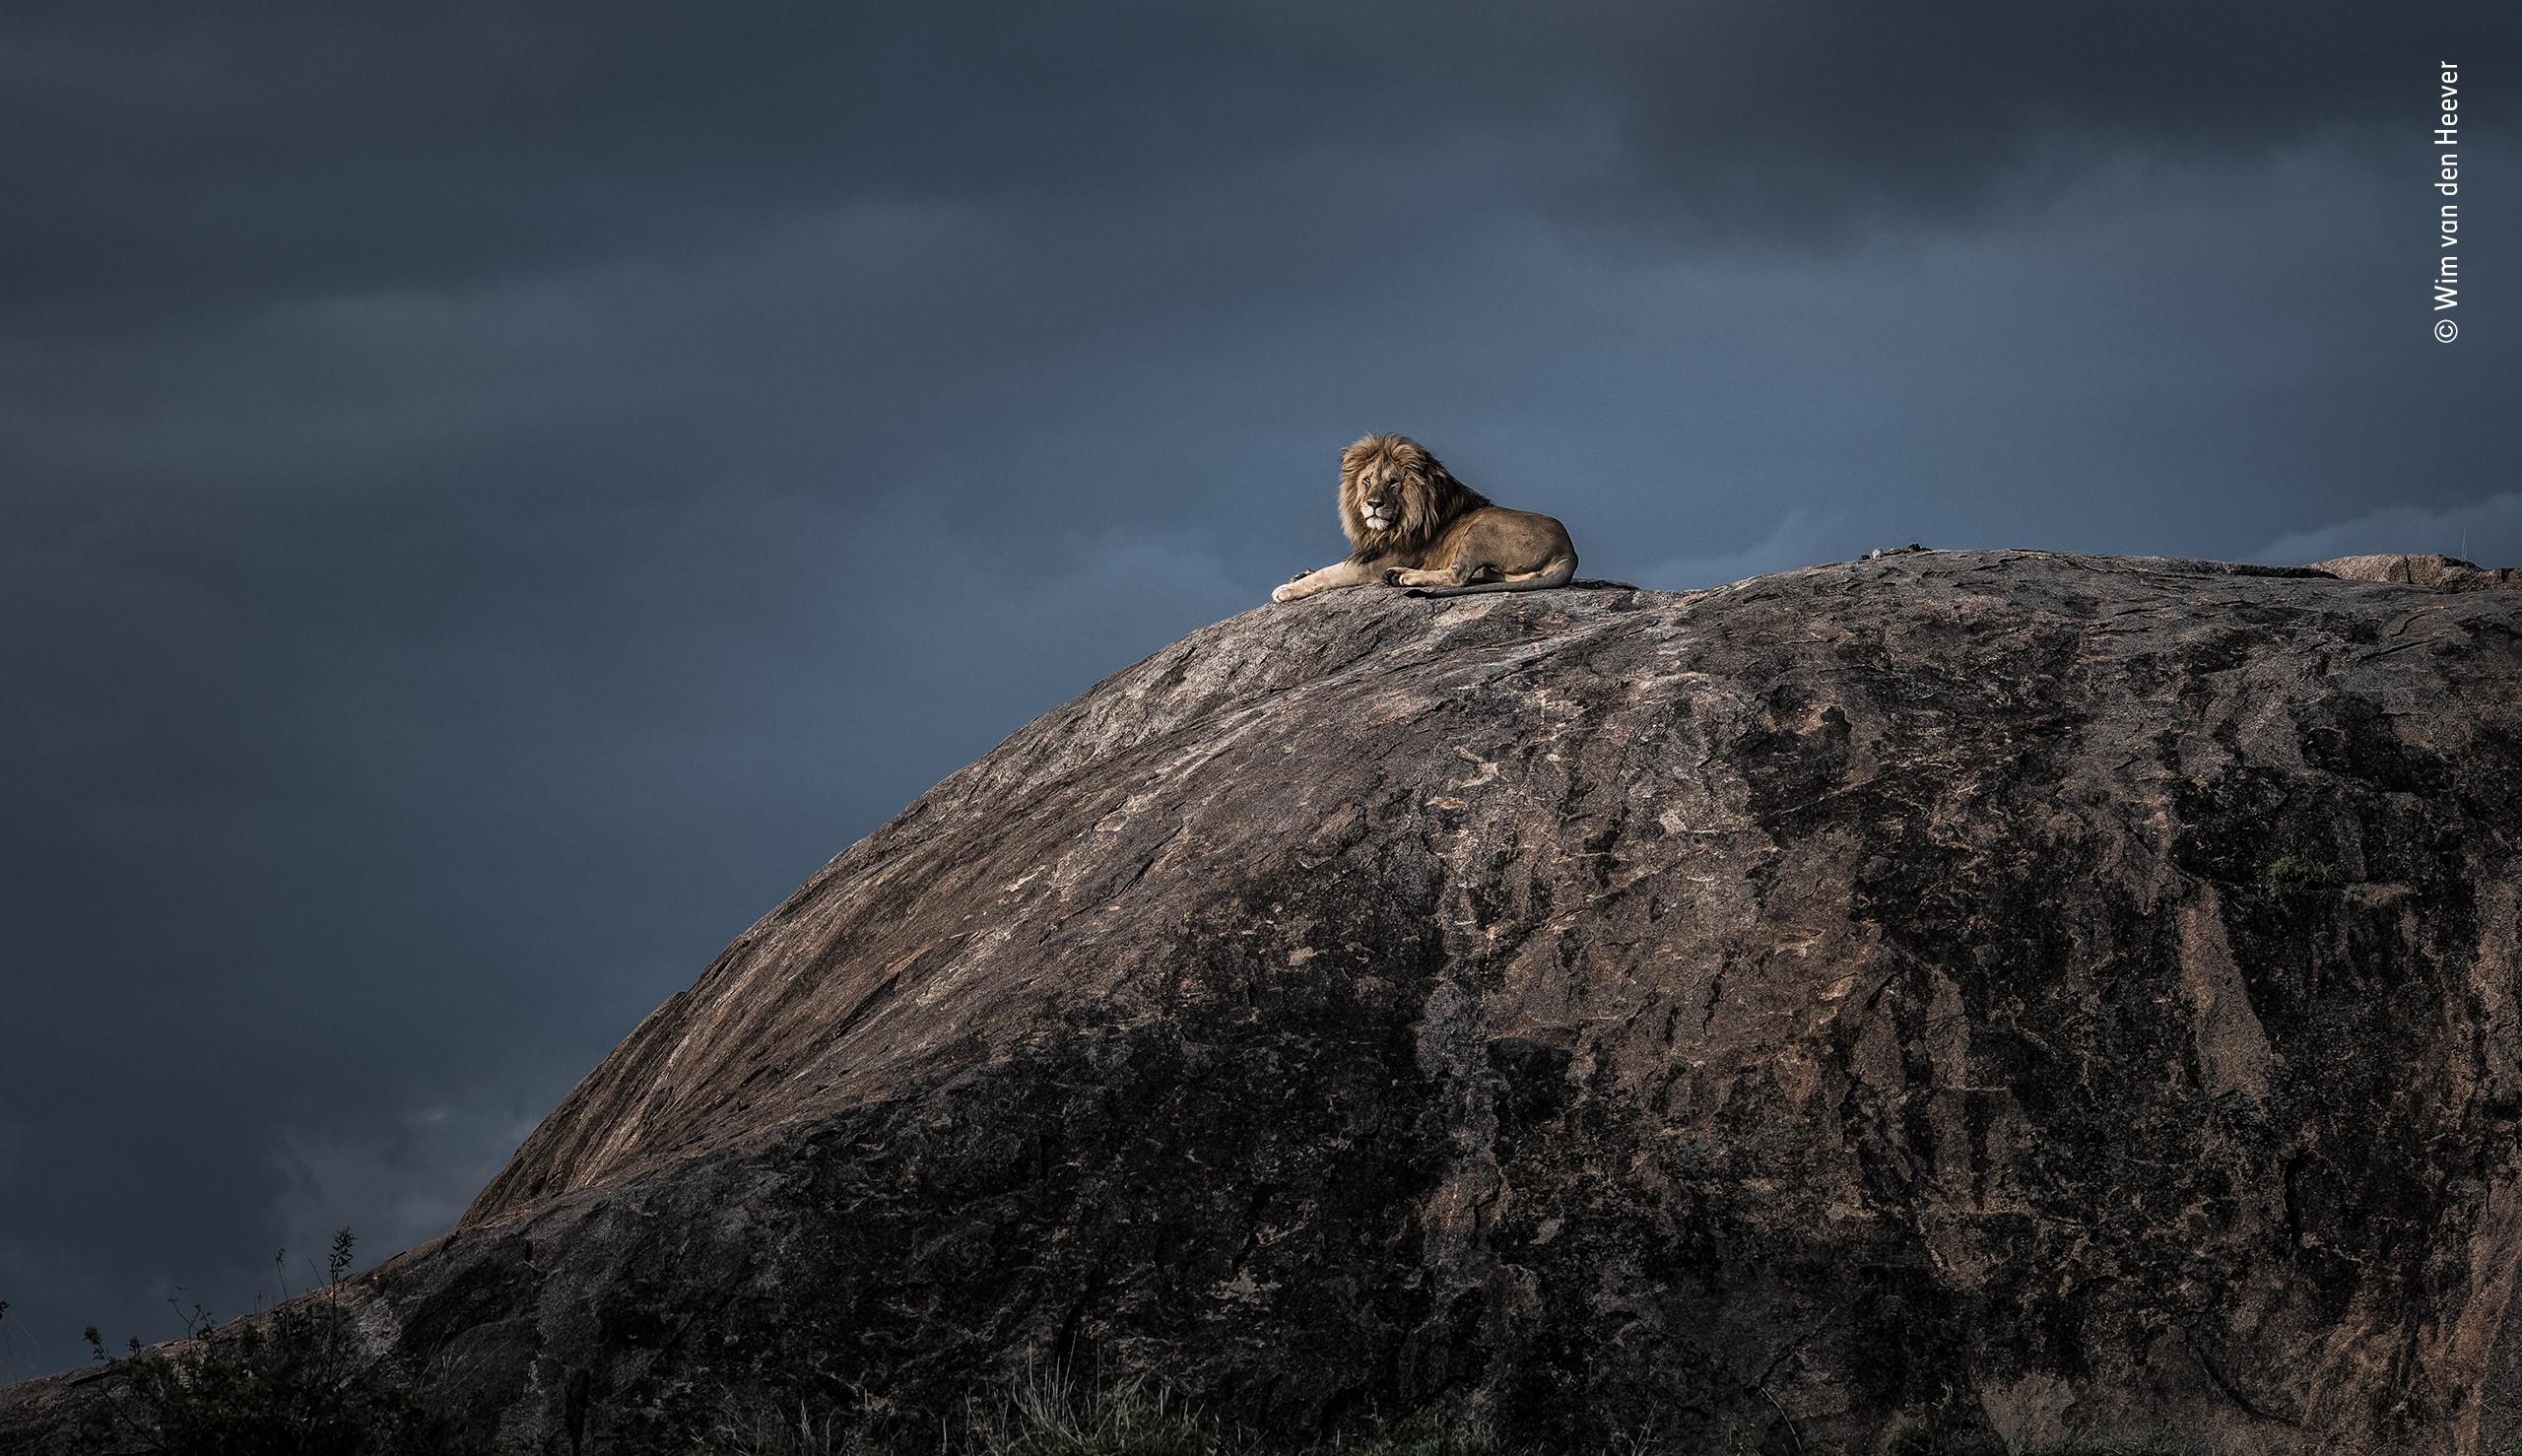 «Король Лев». Серенгети, Танзания. Фотограф Вим ван ден Хеевер